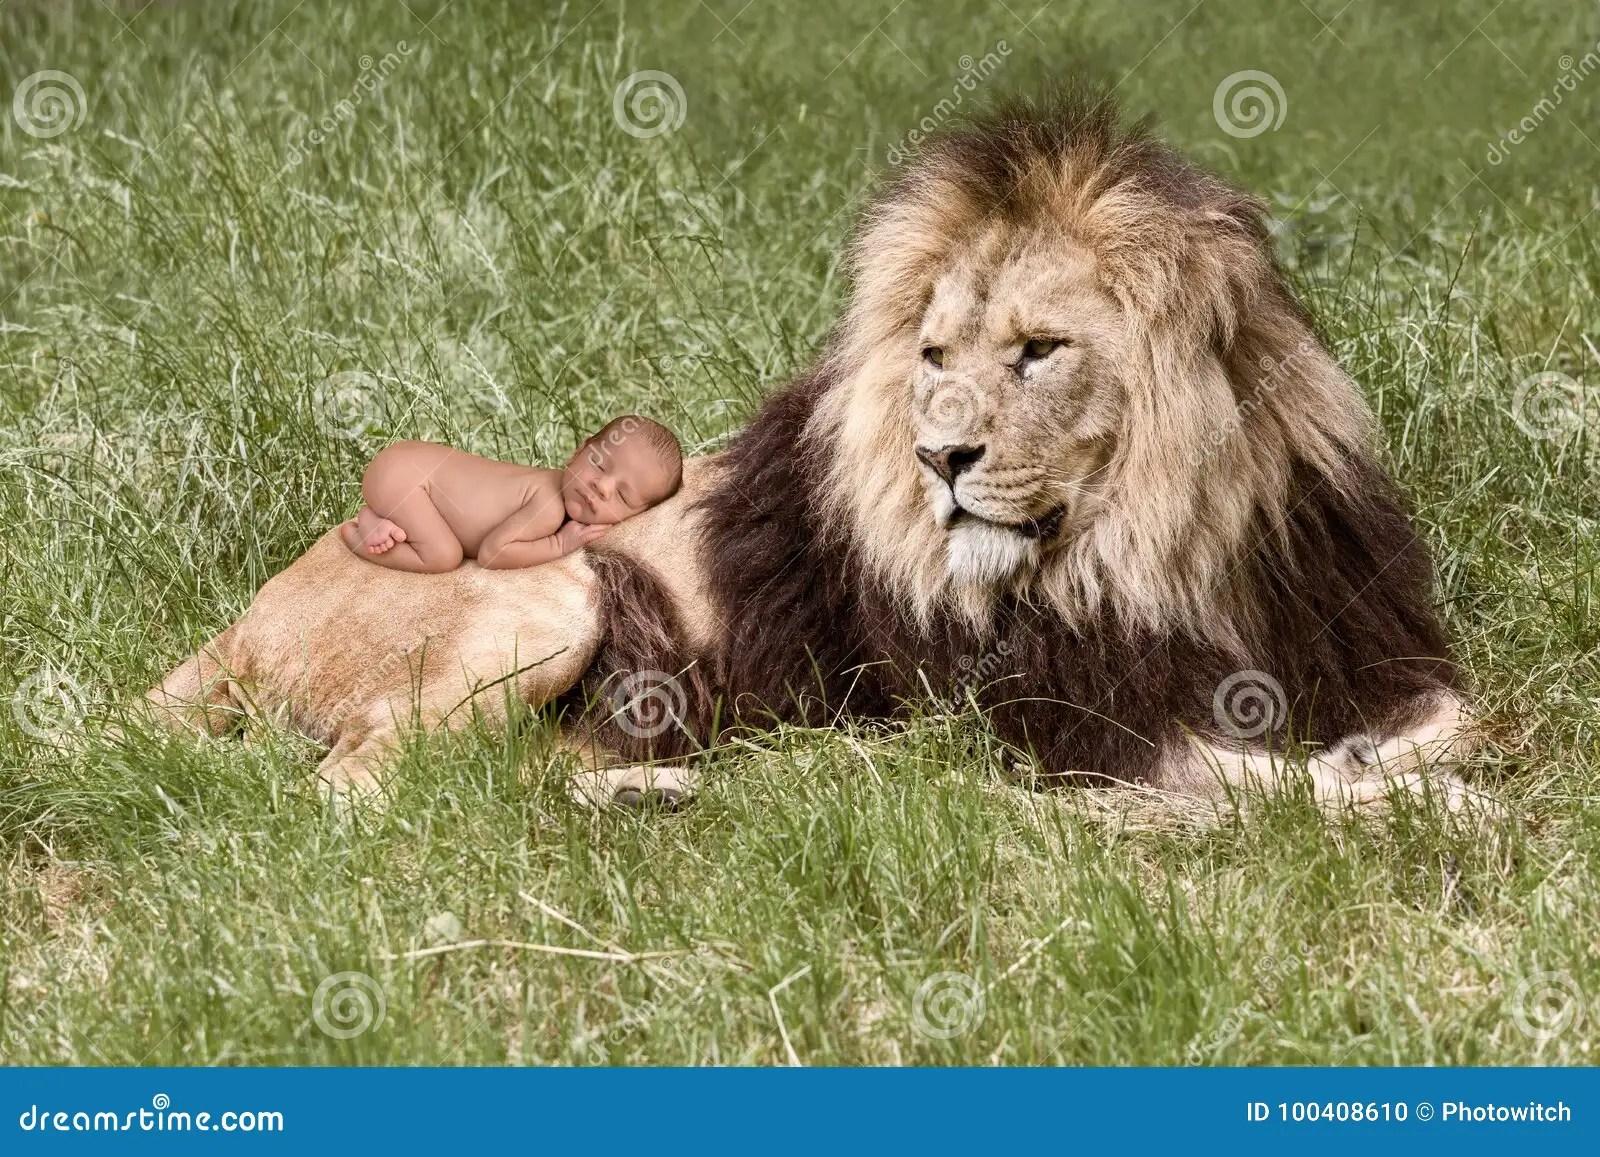 Baby Sleeping On Lion Stock Photo Image Of Child Newborn 100408610